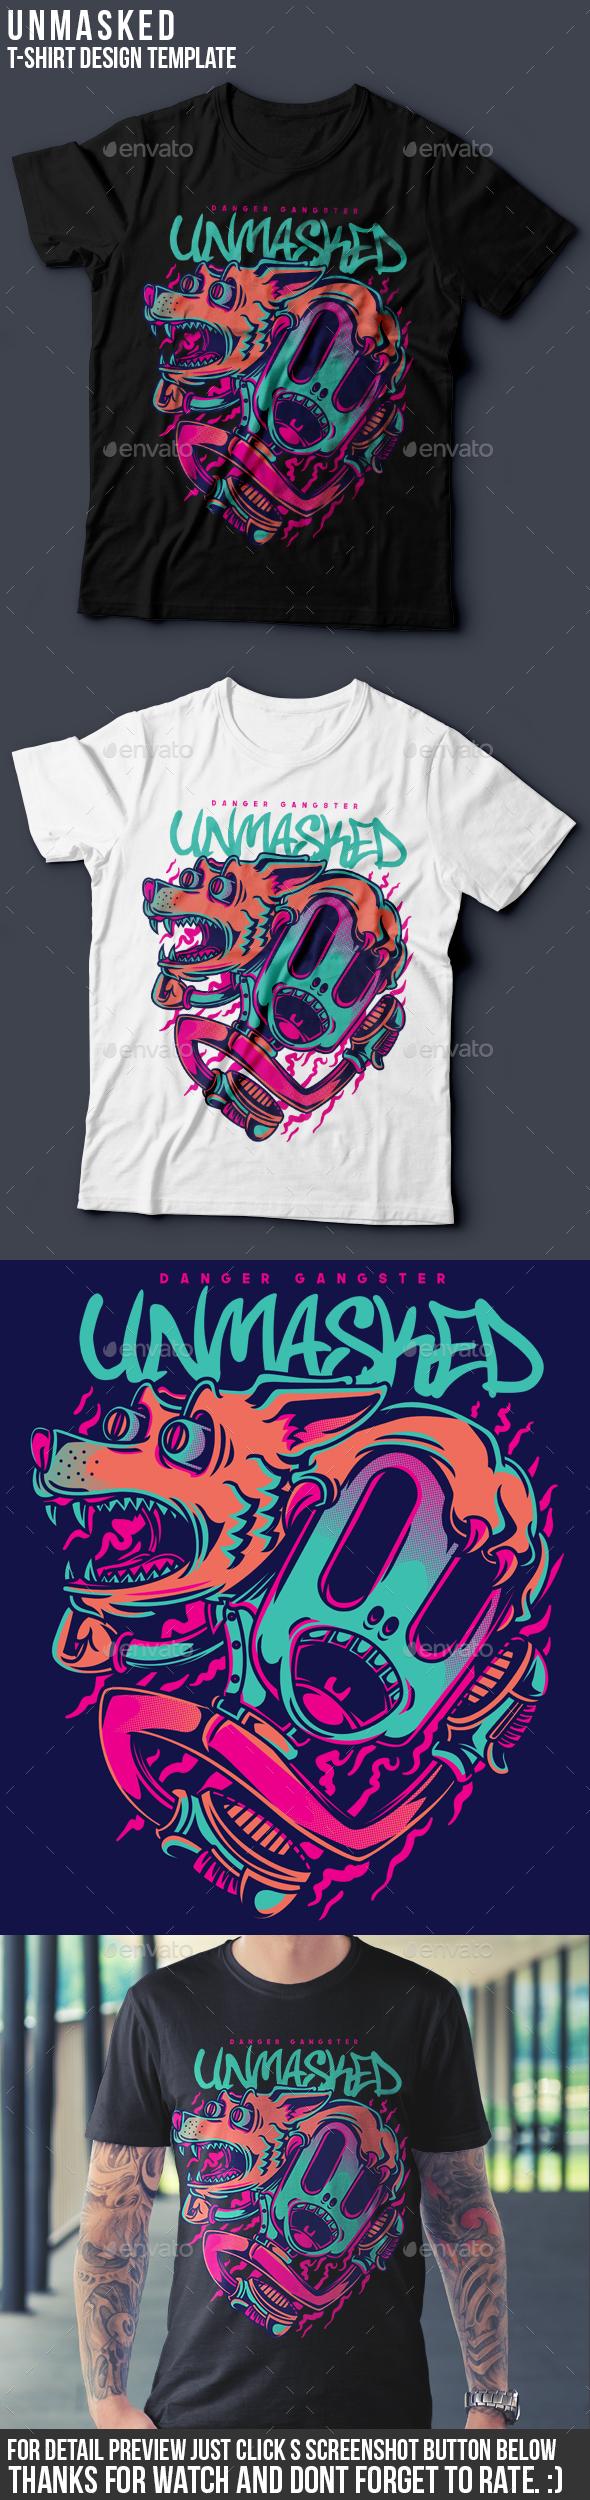 Shirt design fonts - Shirt Design Fonts 31